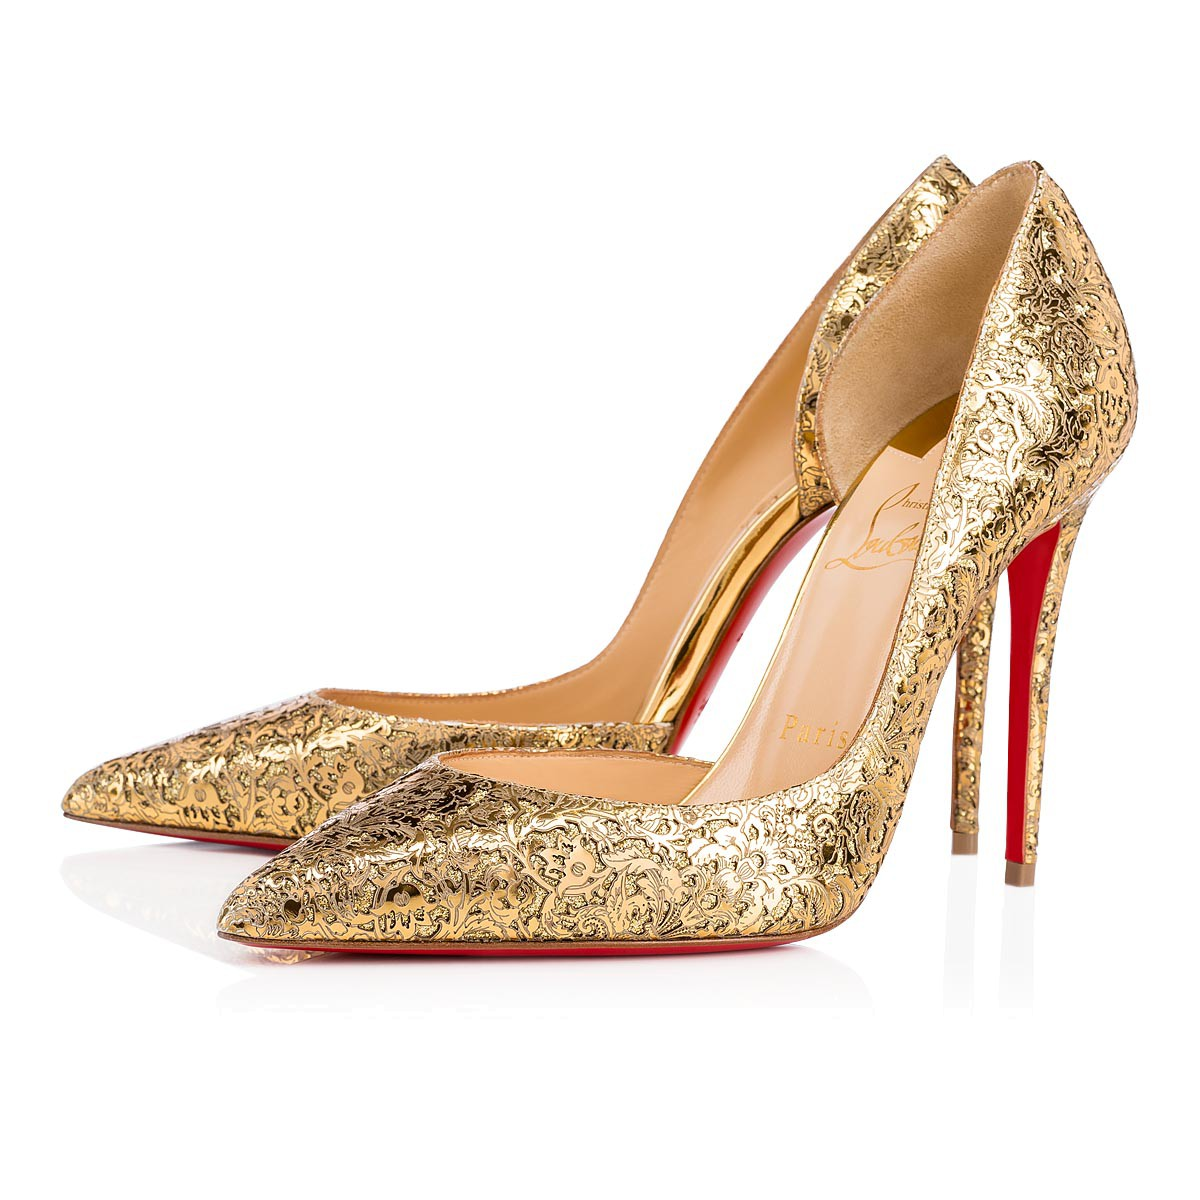 new product 62181 6942c Scarpe eleganti da cerimonia, i modelli più esclusivi per l ...